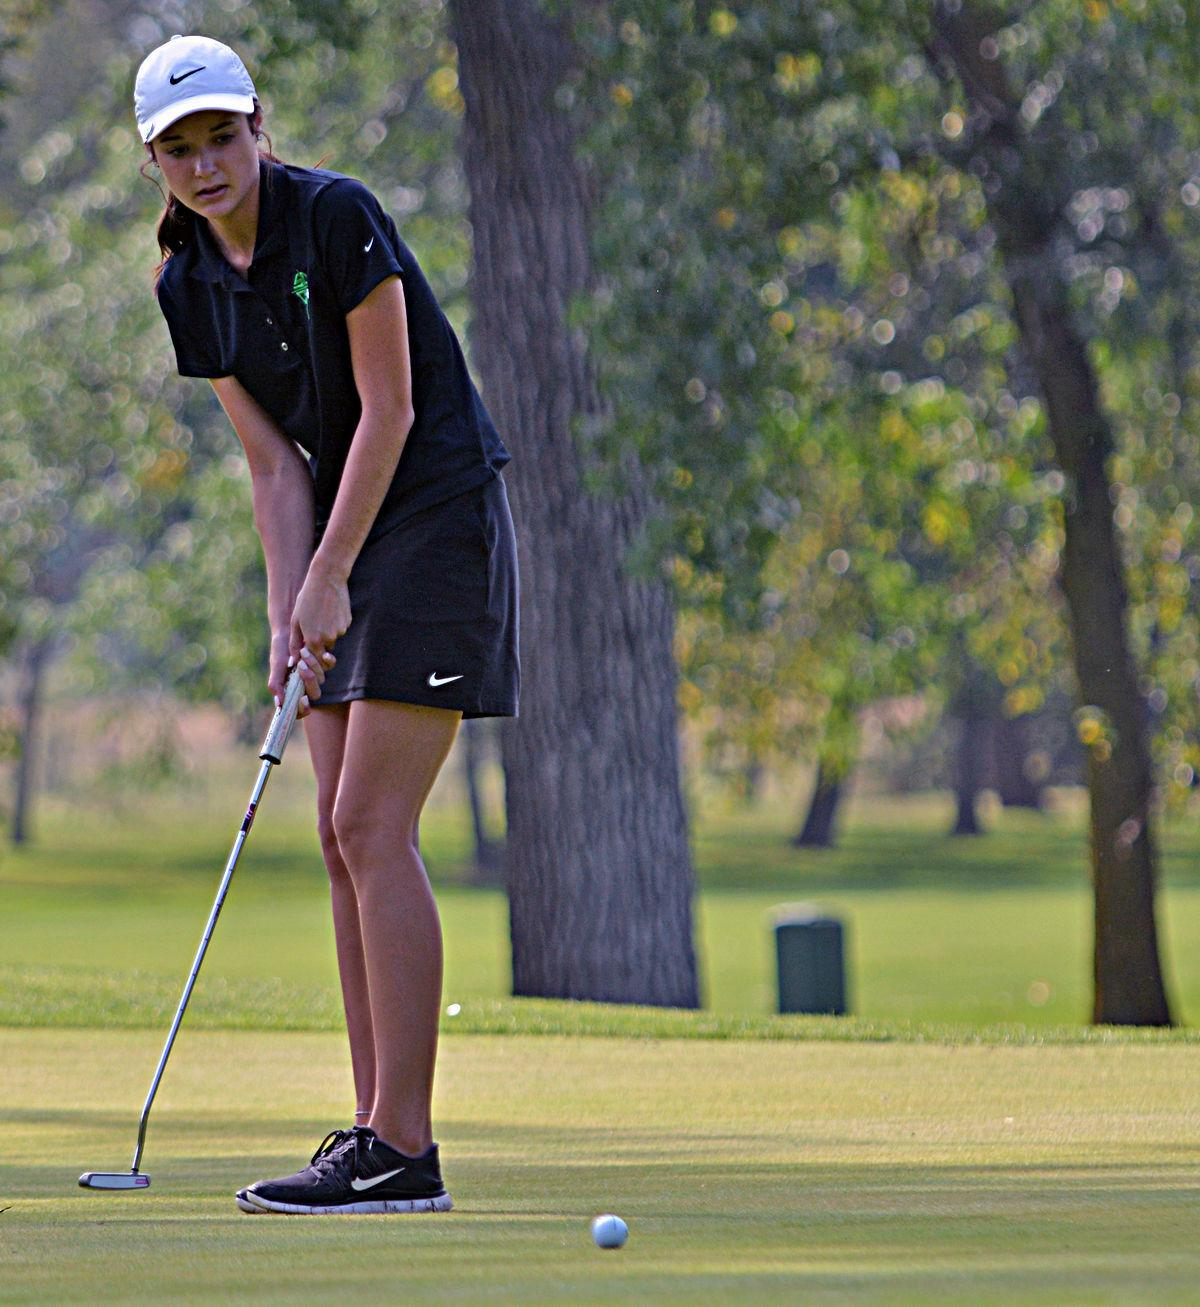 Golf09231702.jpg